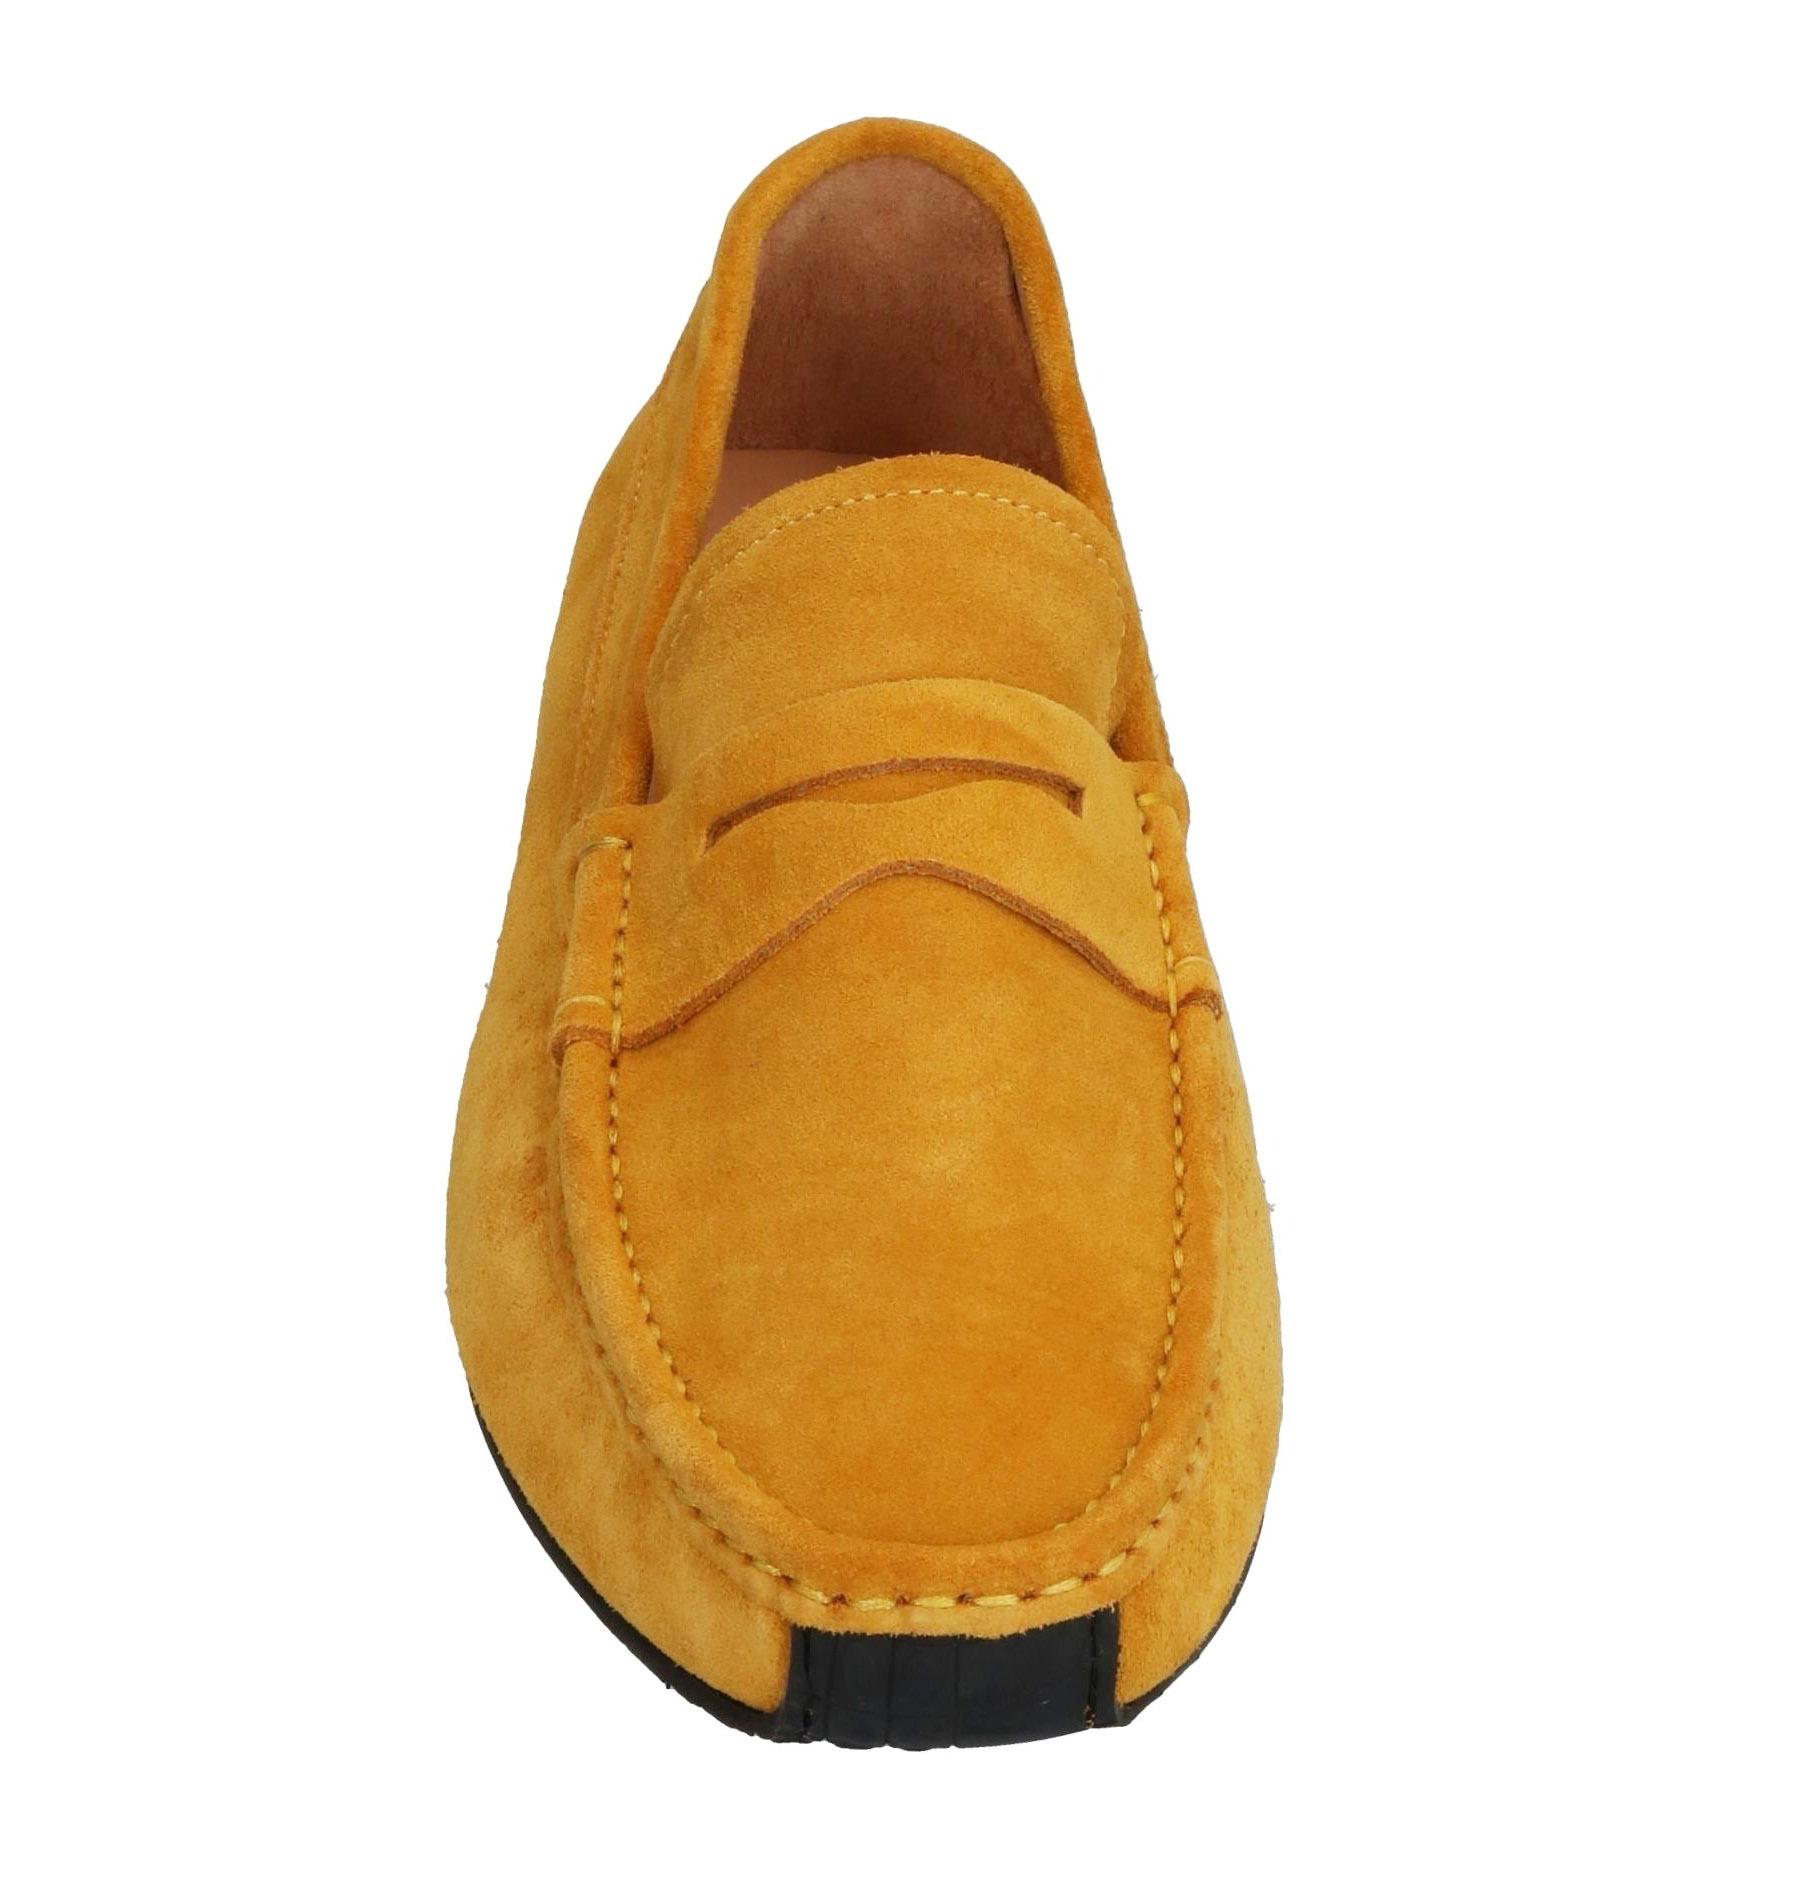 Жёлтые замшевые мокасины на каучуковой подошве Luciano Padovan Made in Italy